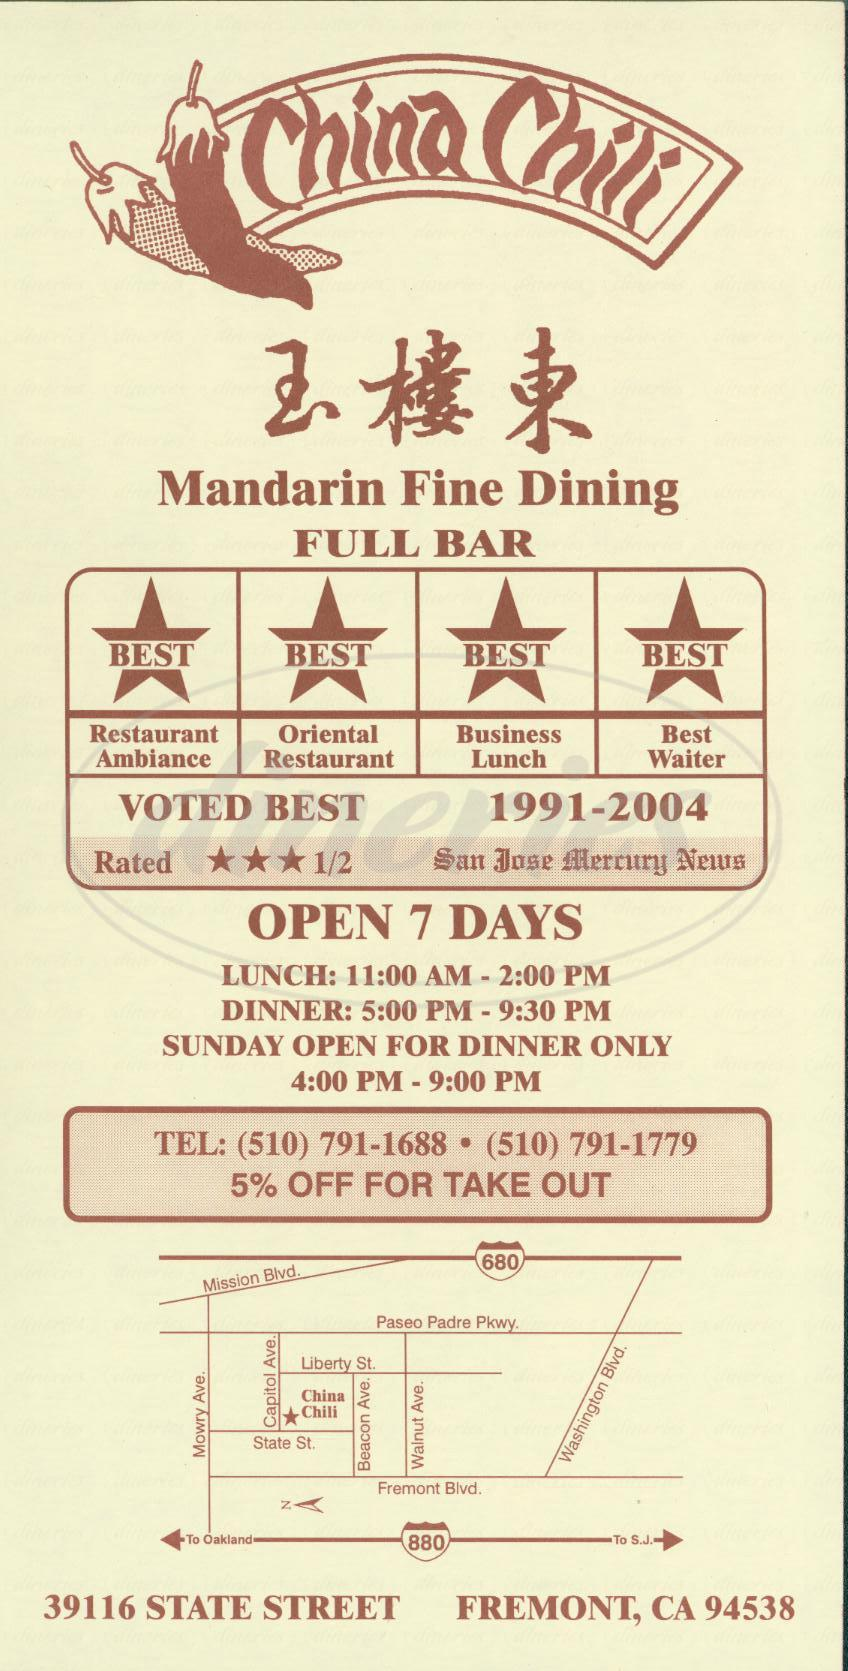 menu for China Chili Restaurant